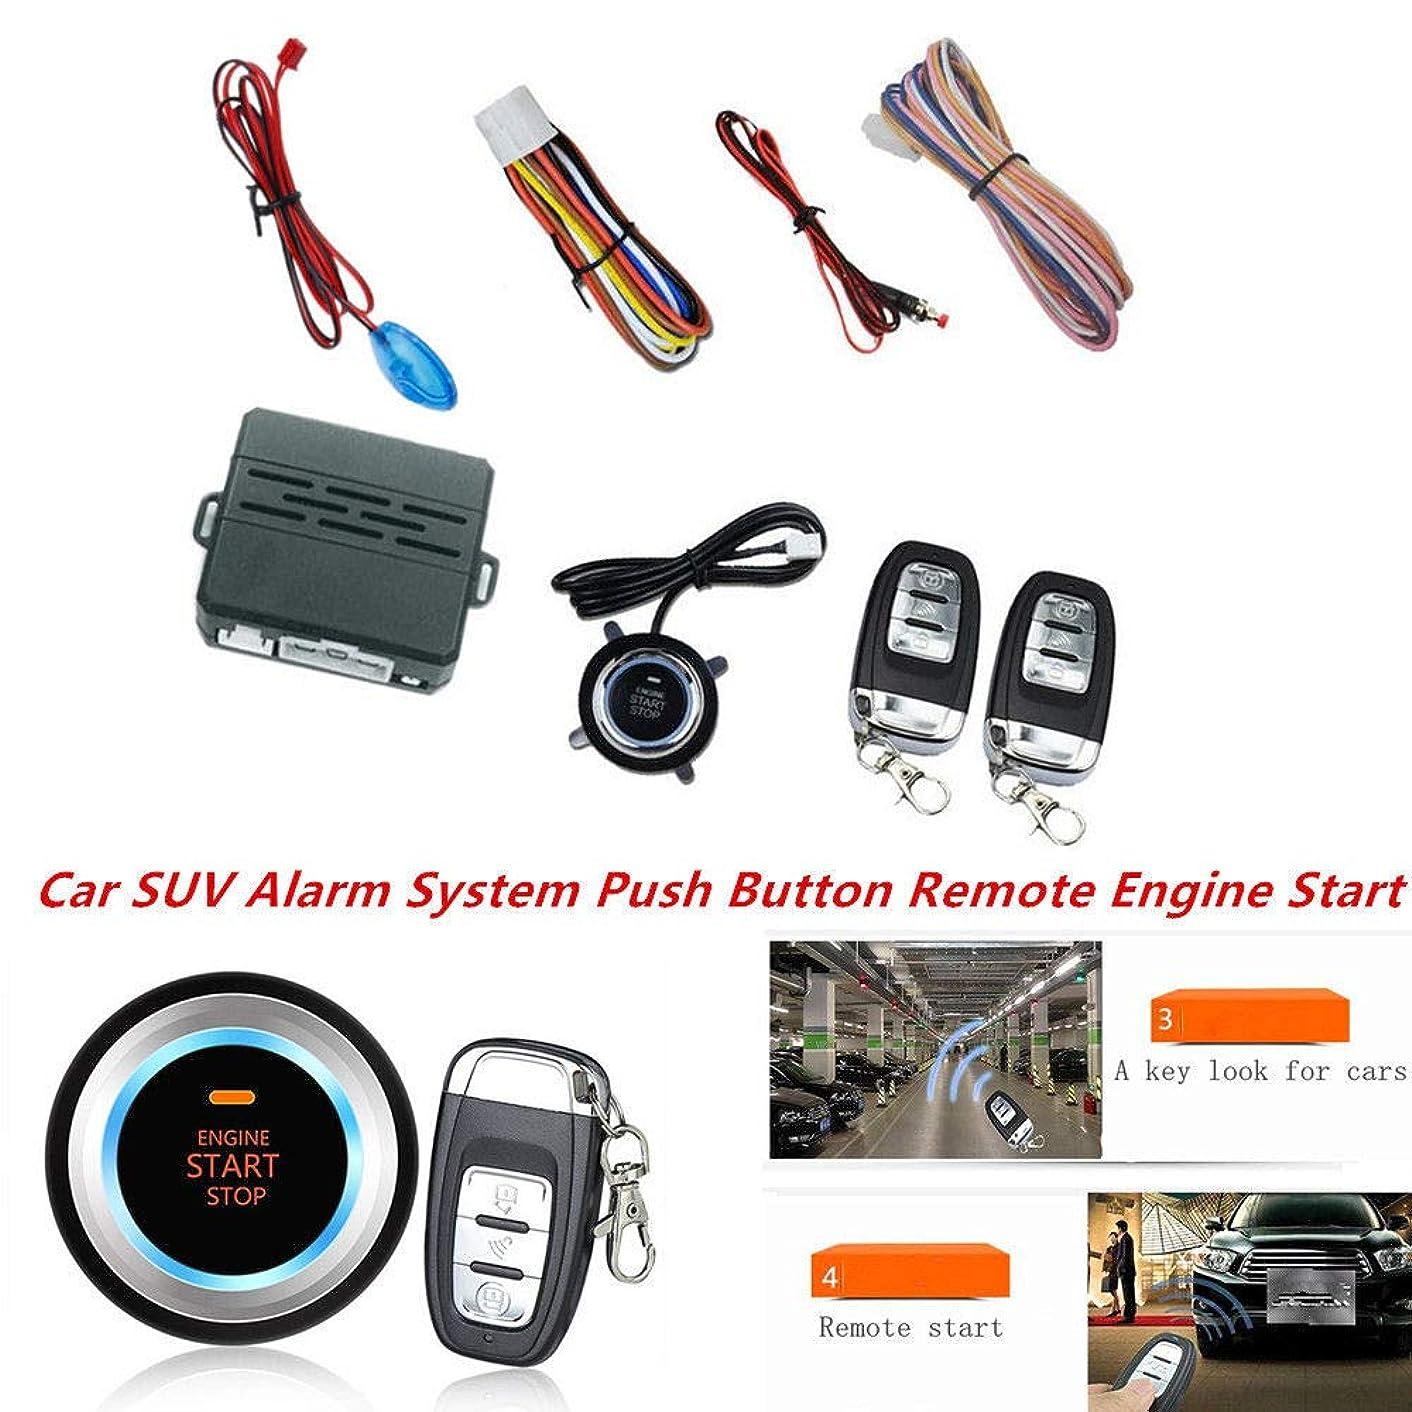 FidgetKute Car Auto SUV Alarm System Push Button Remote Engine Start with LED Sensor Lights